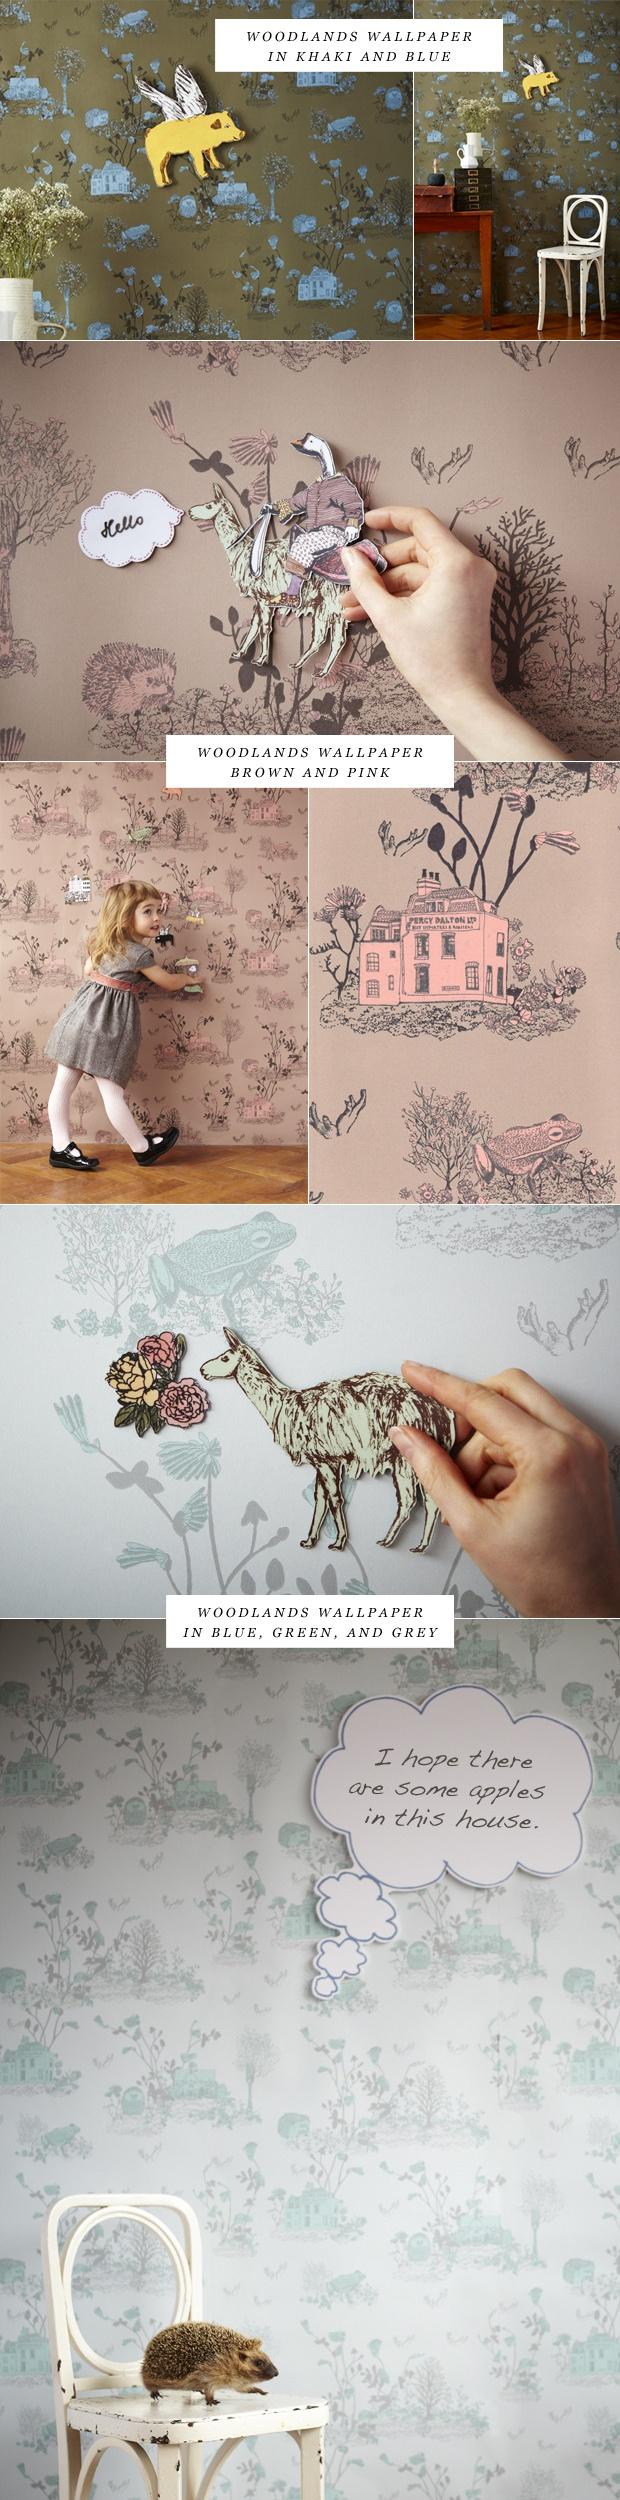 wallpaper8